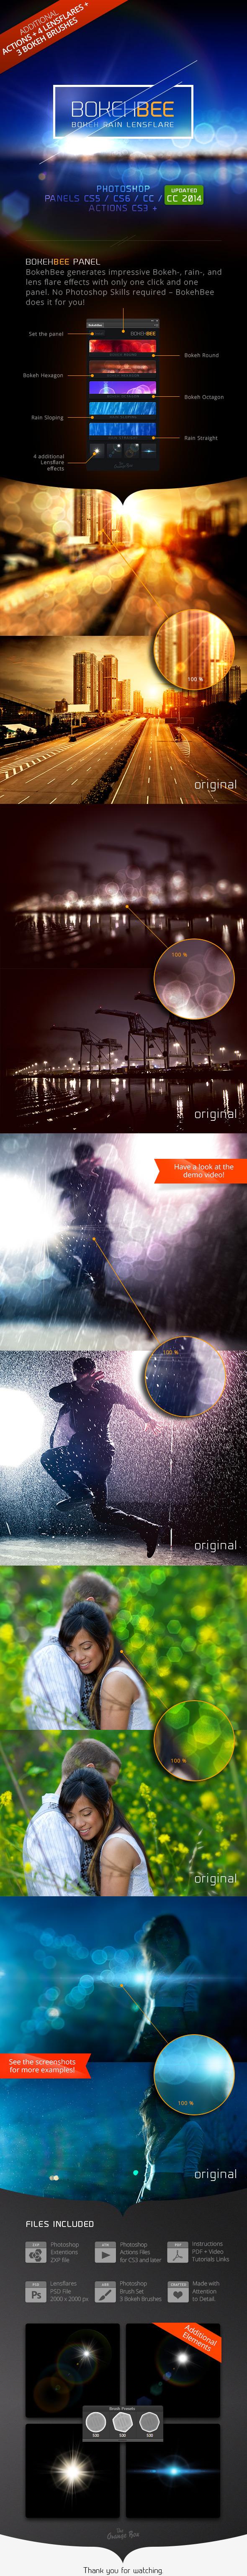 BokehBee - Bokeh Rain Lens-Flare Generator - Actions Photoshop